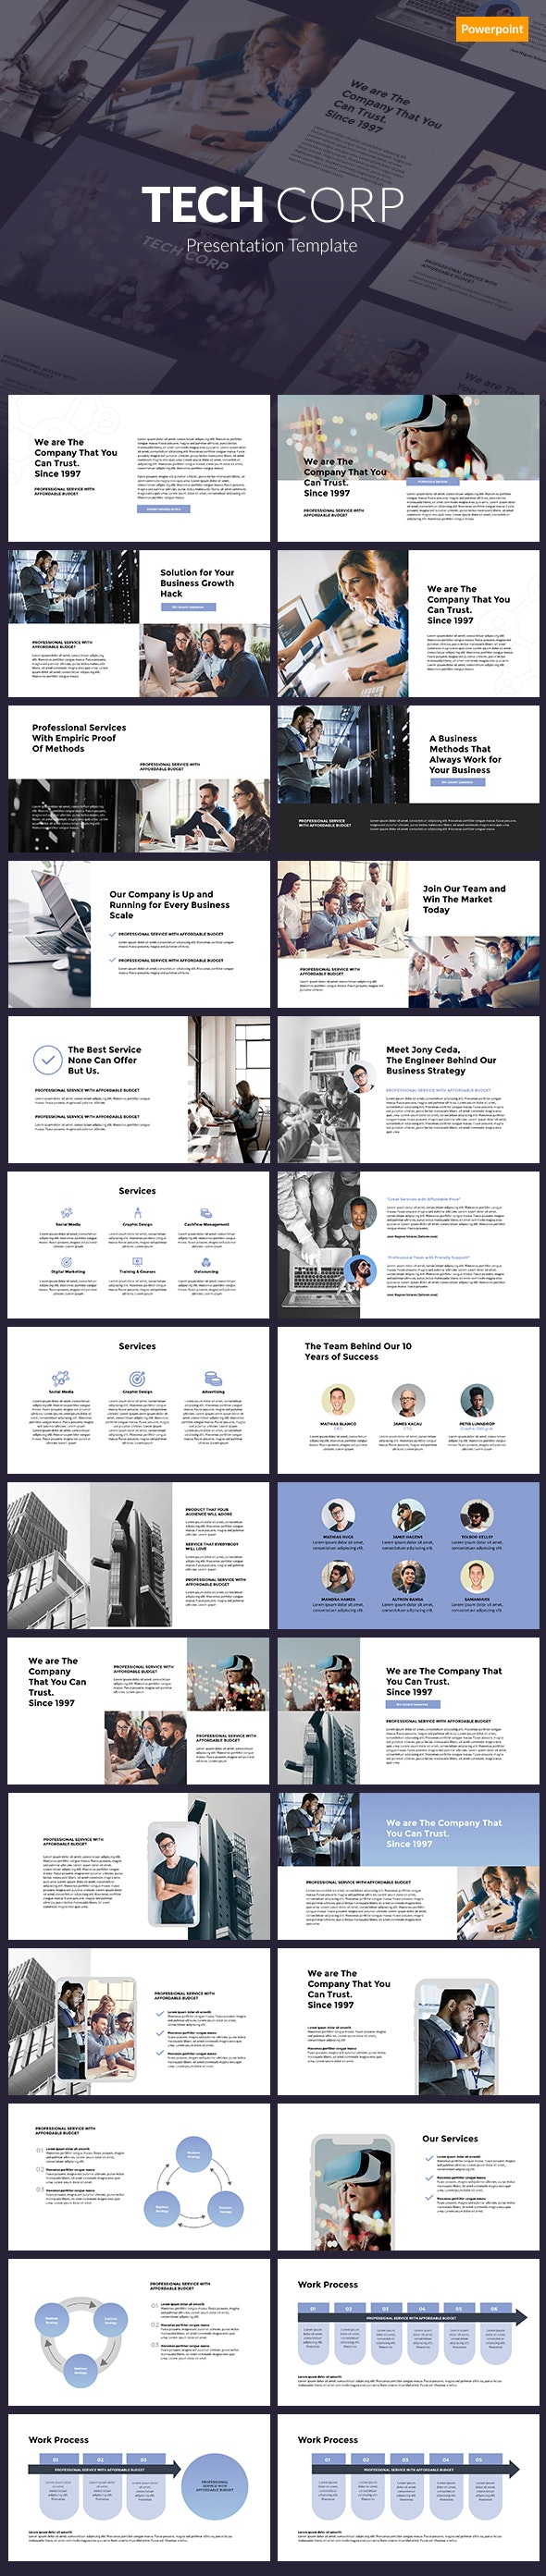 Tech Corp - Powerpoint Template - PowerPoint Templates Presentation Templates